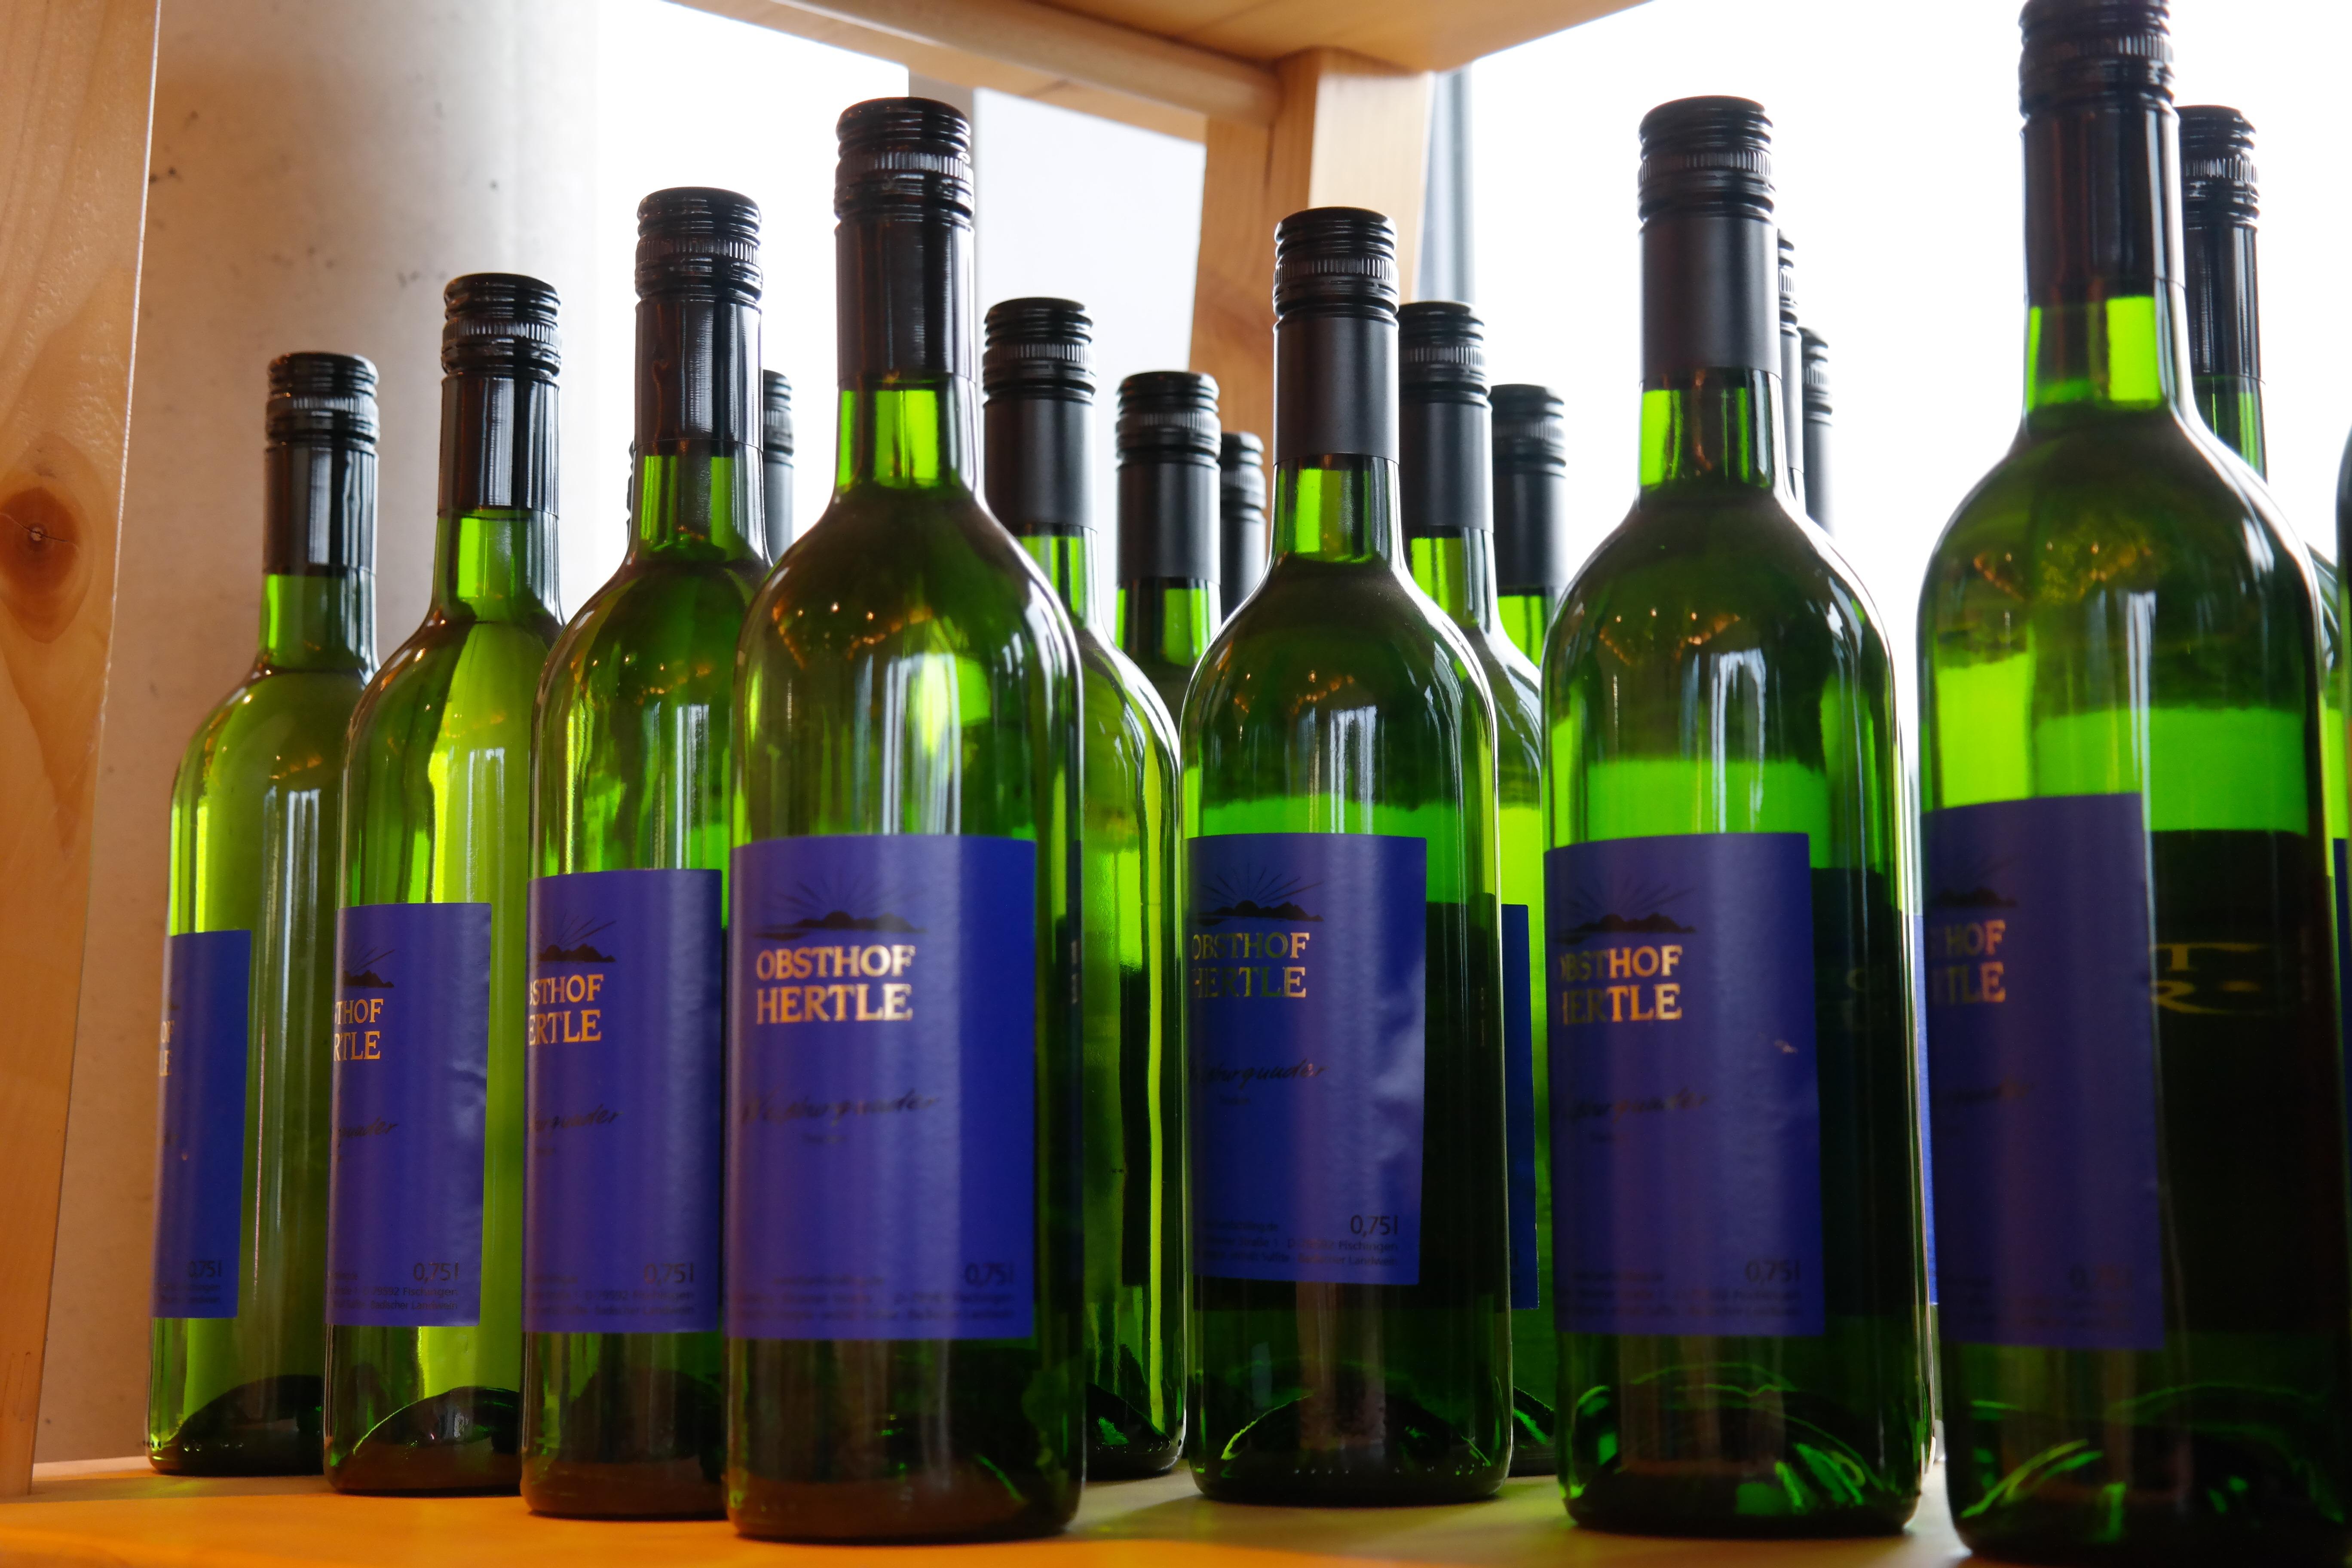 Free Images : green, drink, shelf, blue, alcohol, wine bottle, glass ...